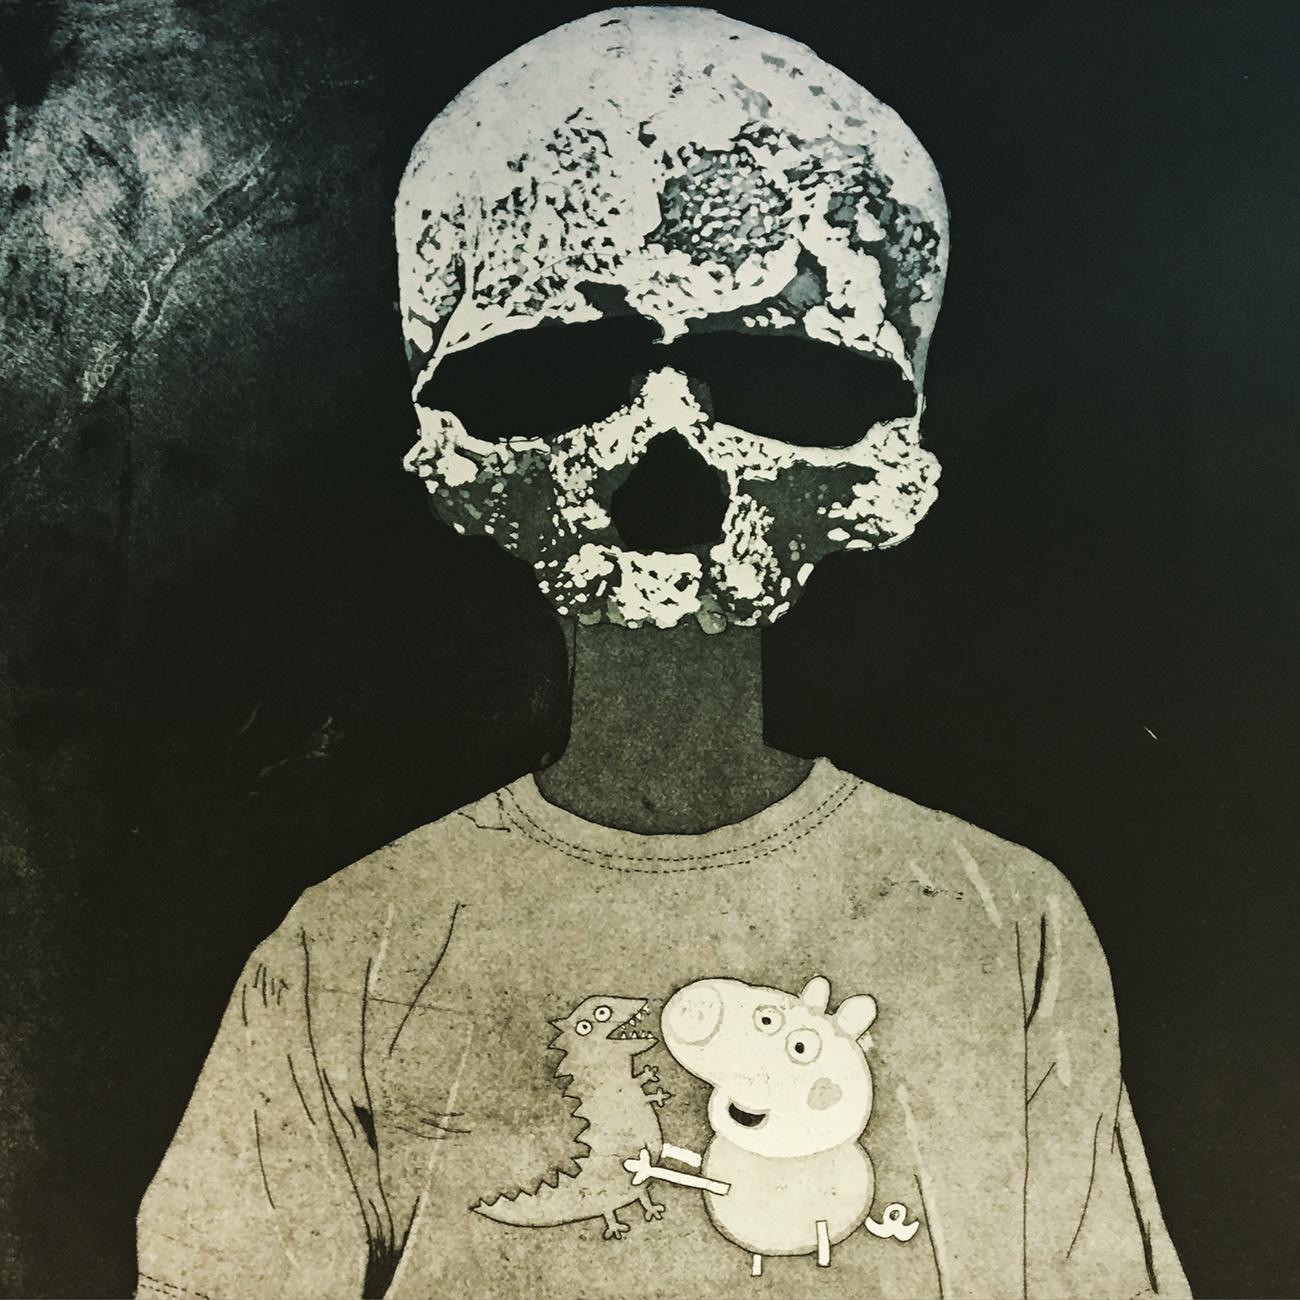 """A Skeleton Always Sells, Dear""   Etching and aquatint on zinc  35 x 29 cm  2016"